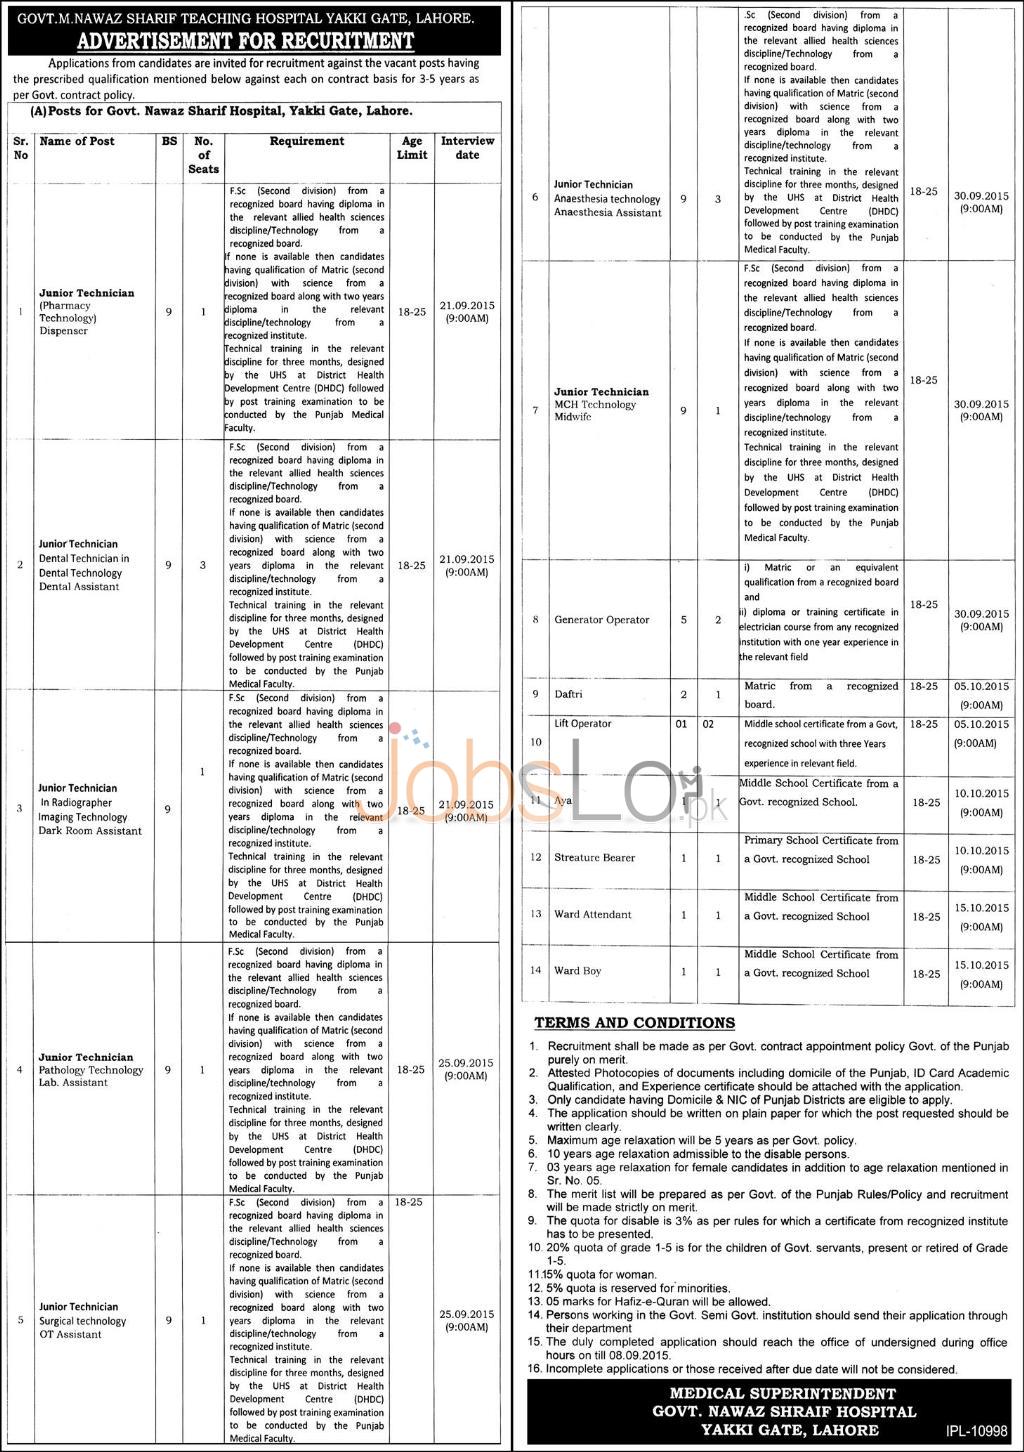 Govt Nawaz Sharif Teaching Hospital Lahore Jobs